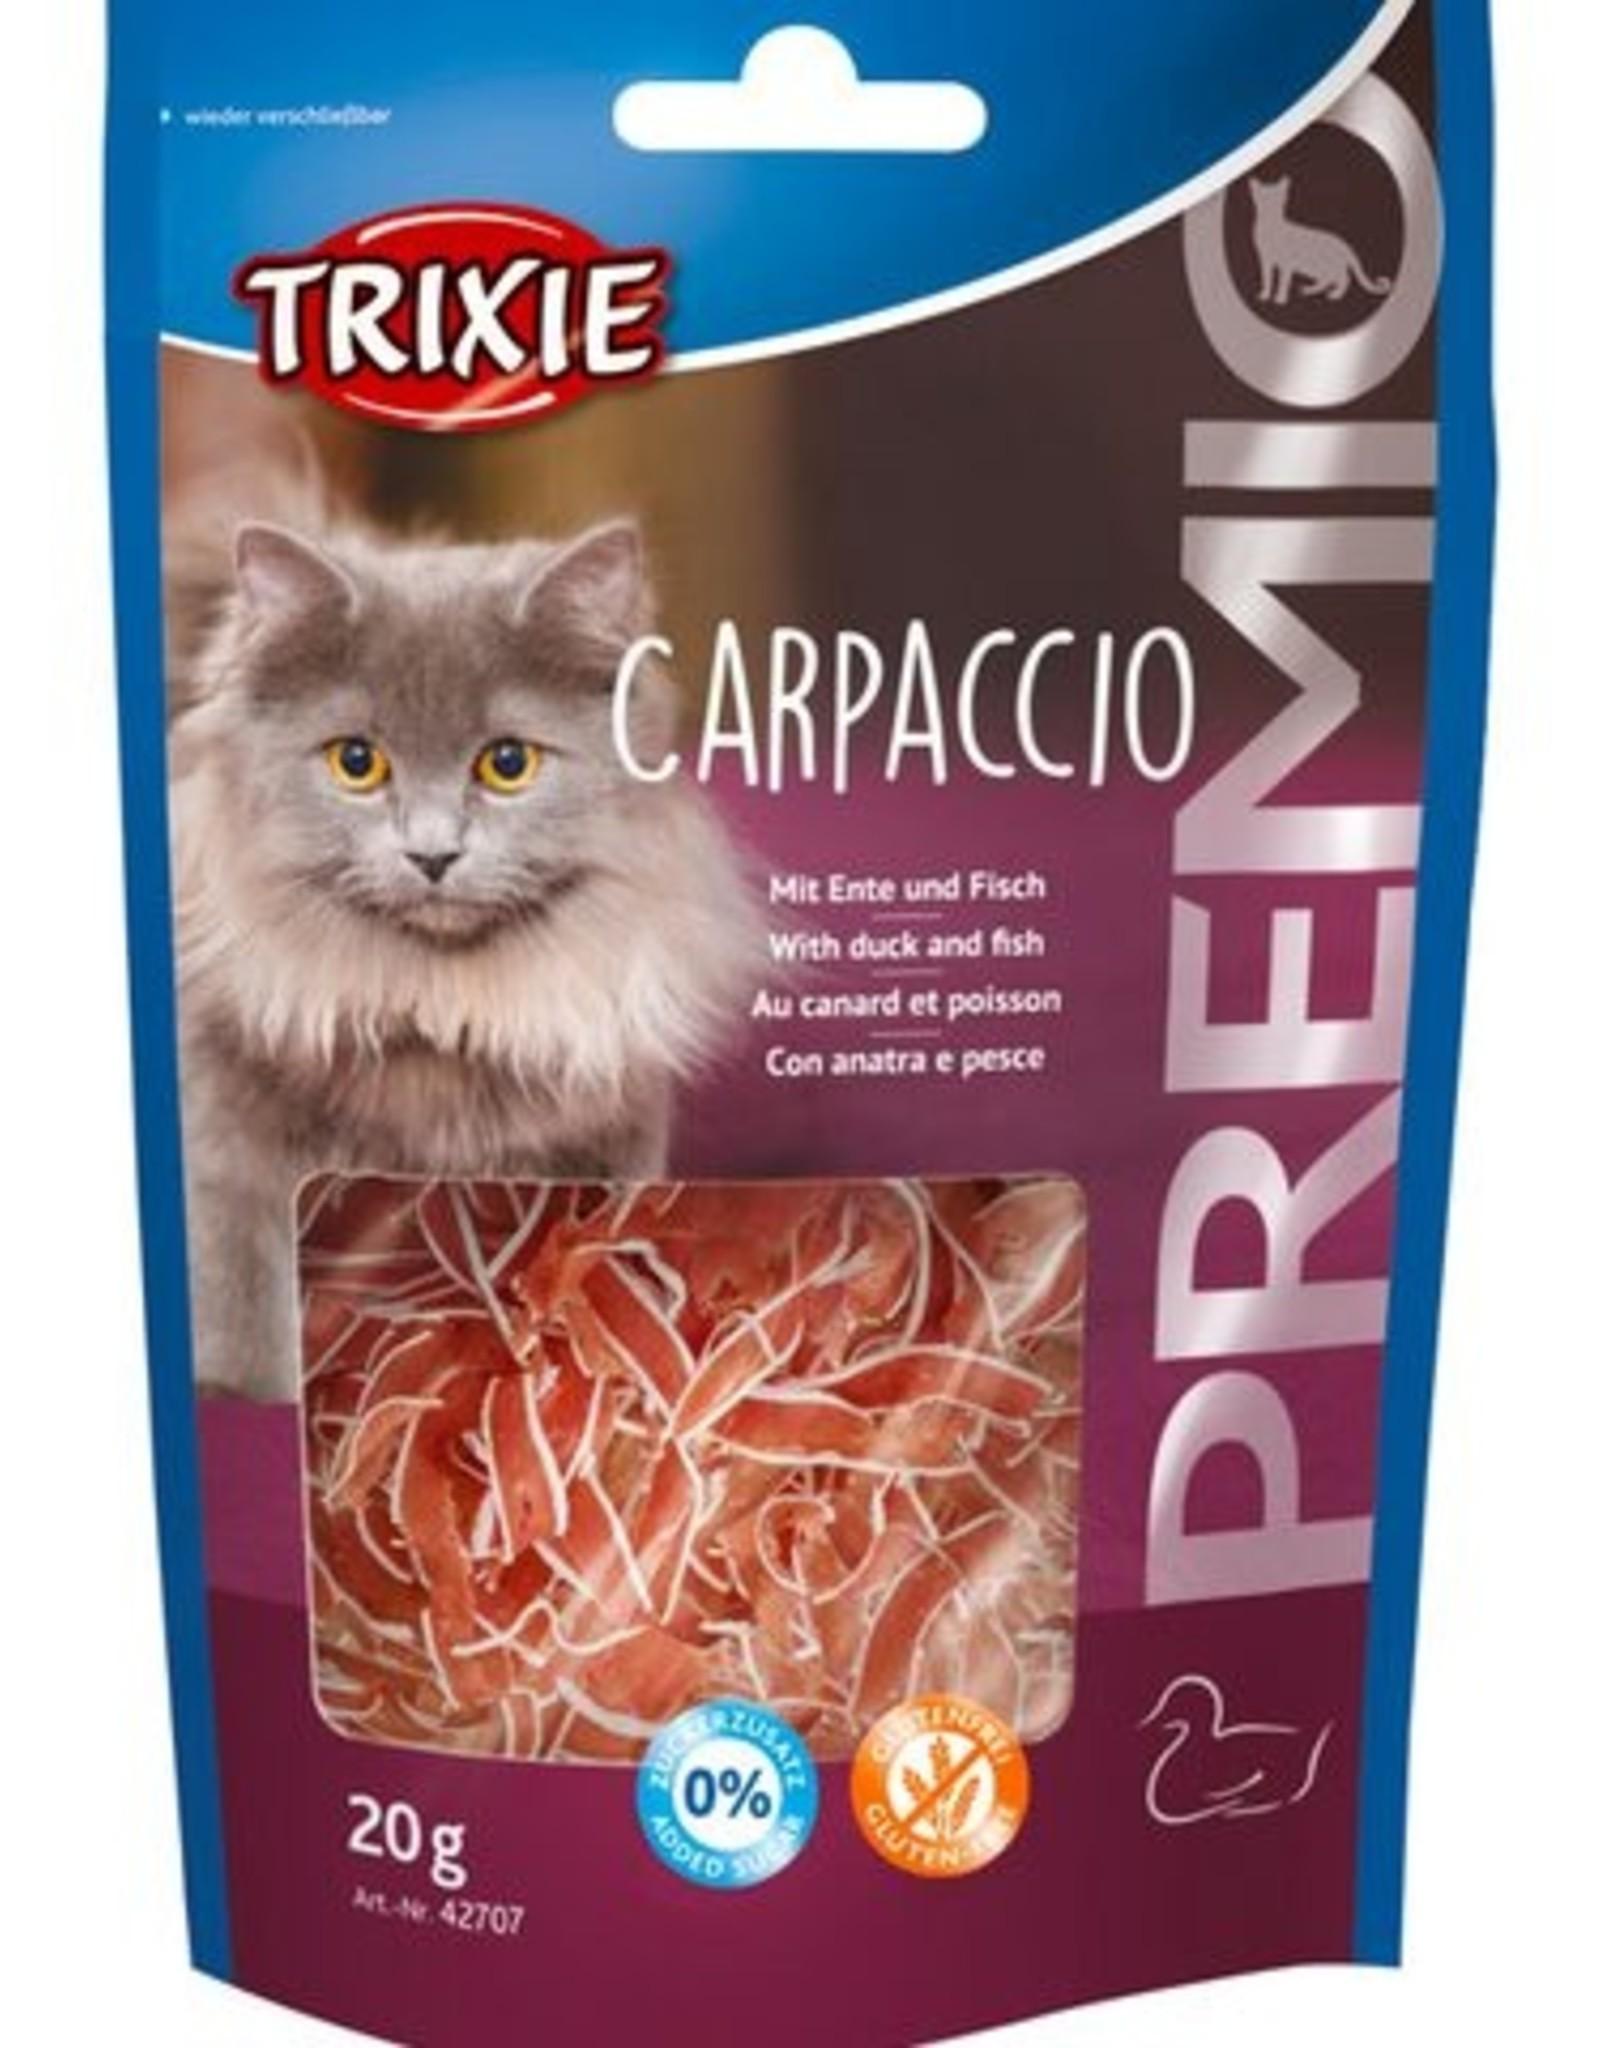 Trixie Trixie - Carpaccio